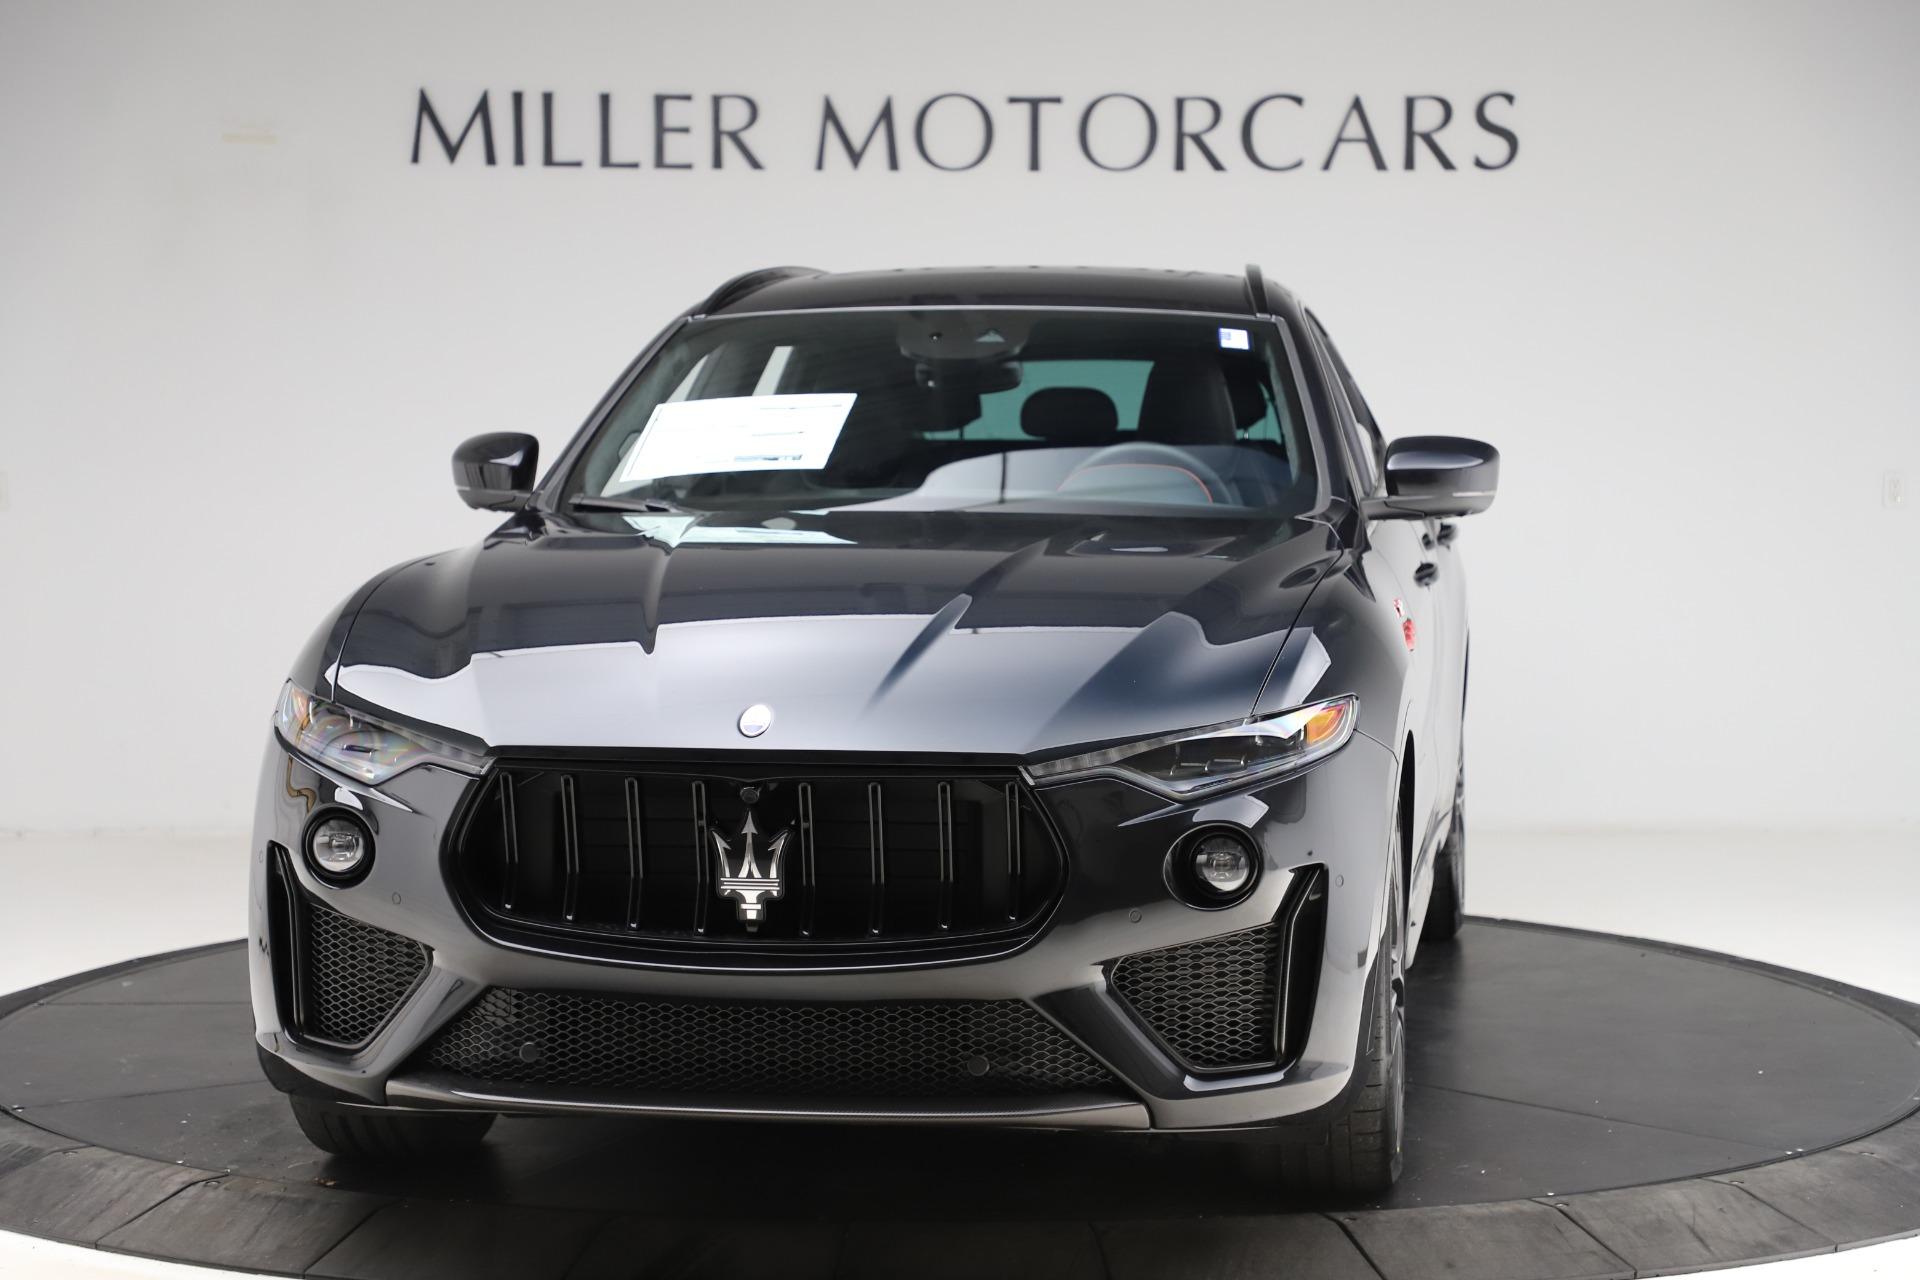 New 2021 Maserati Levante Trofeo for sale $155,035 at Rolls-Royce Motor Cars Greenwich in Greenwich CT 06830 1